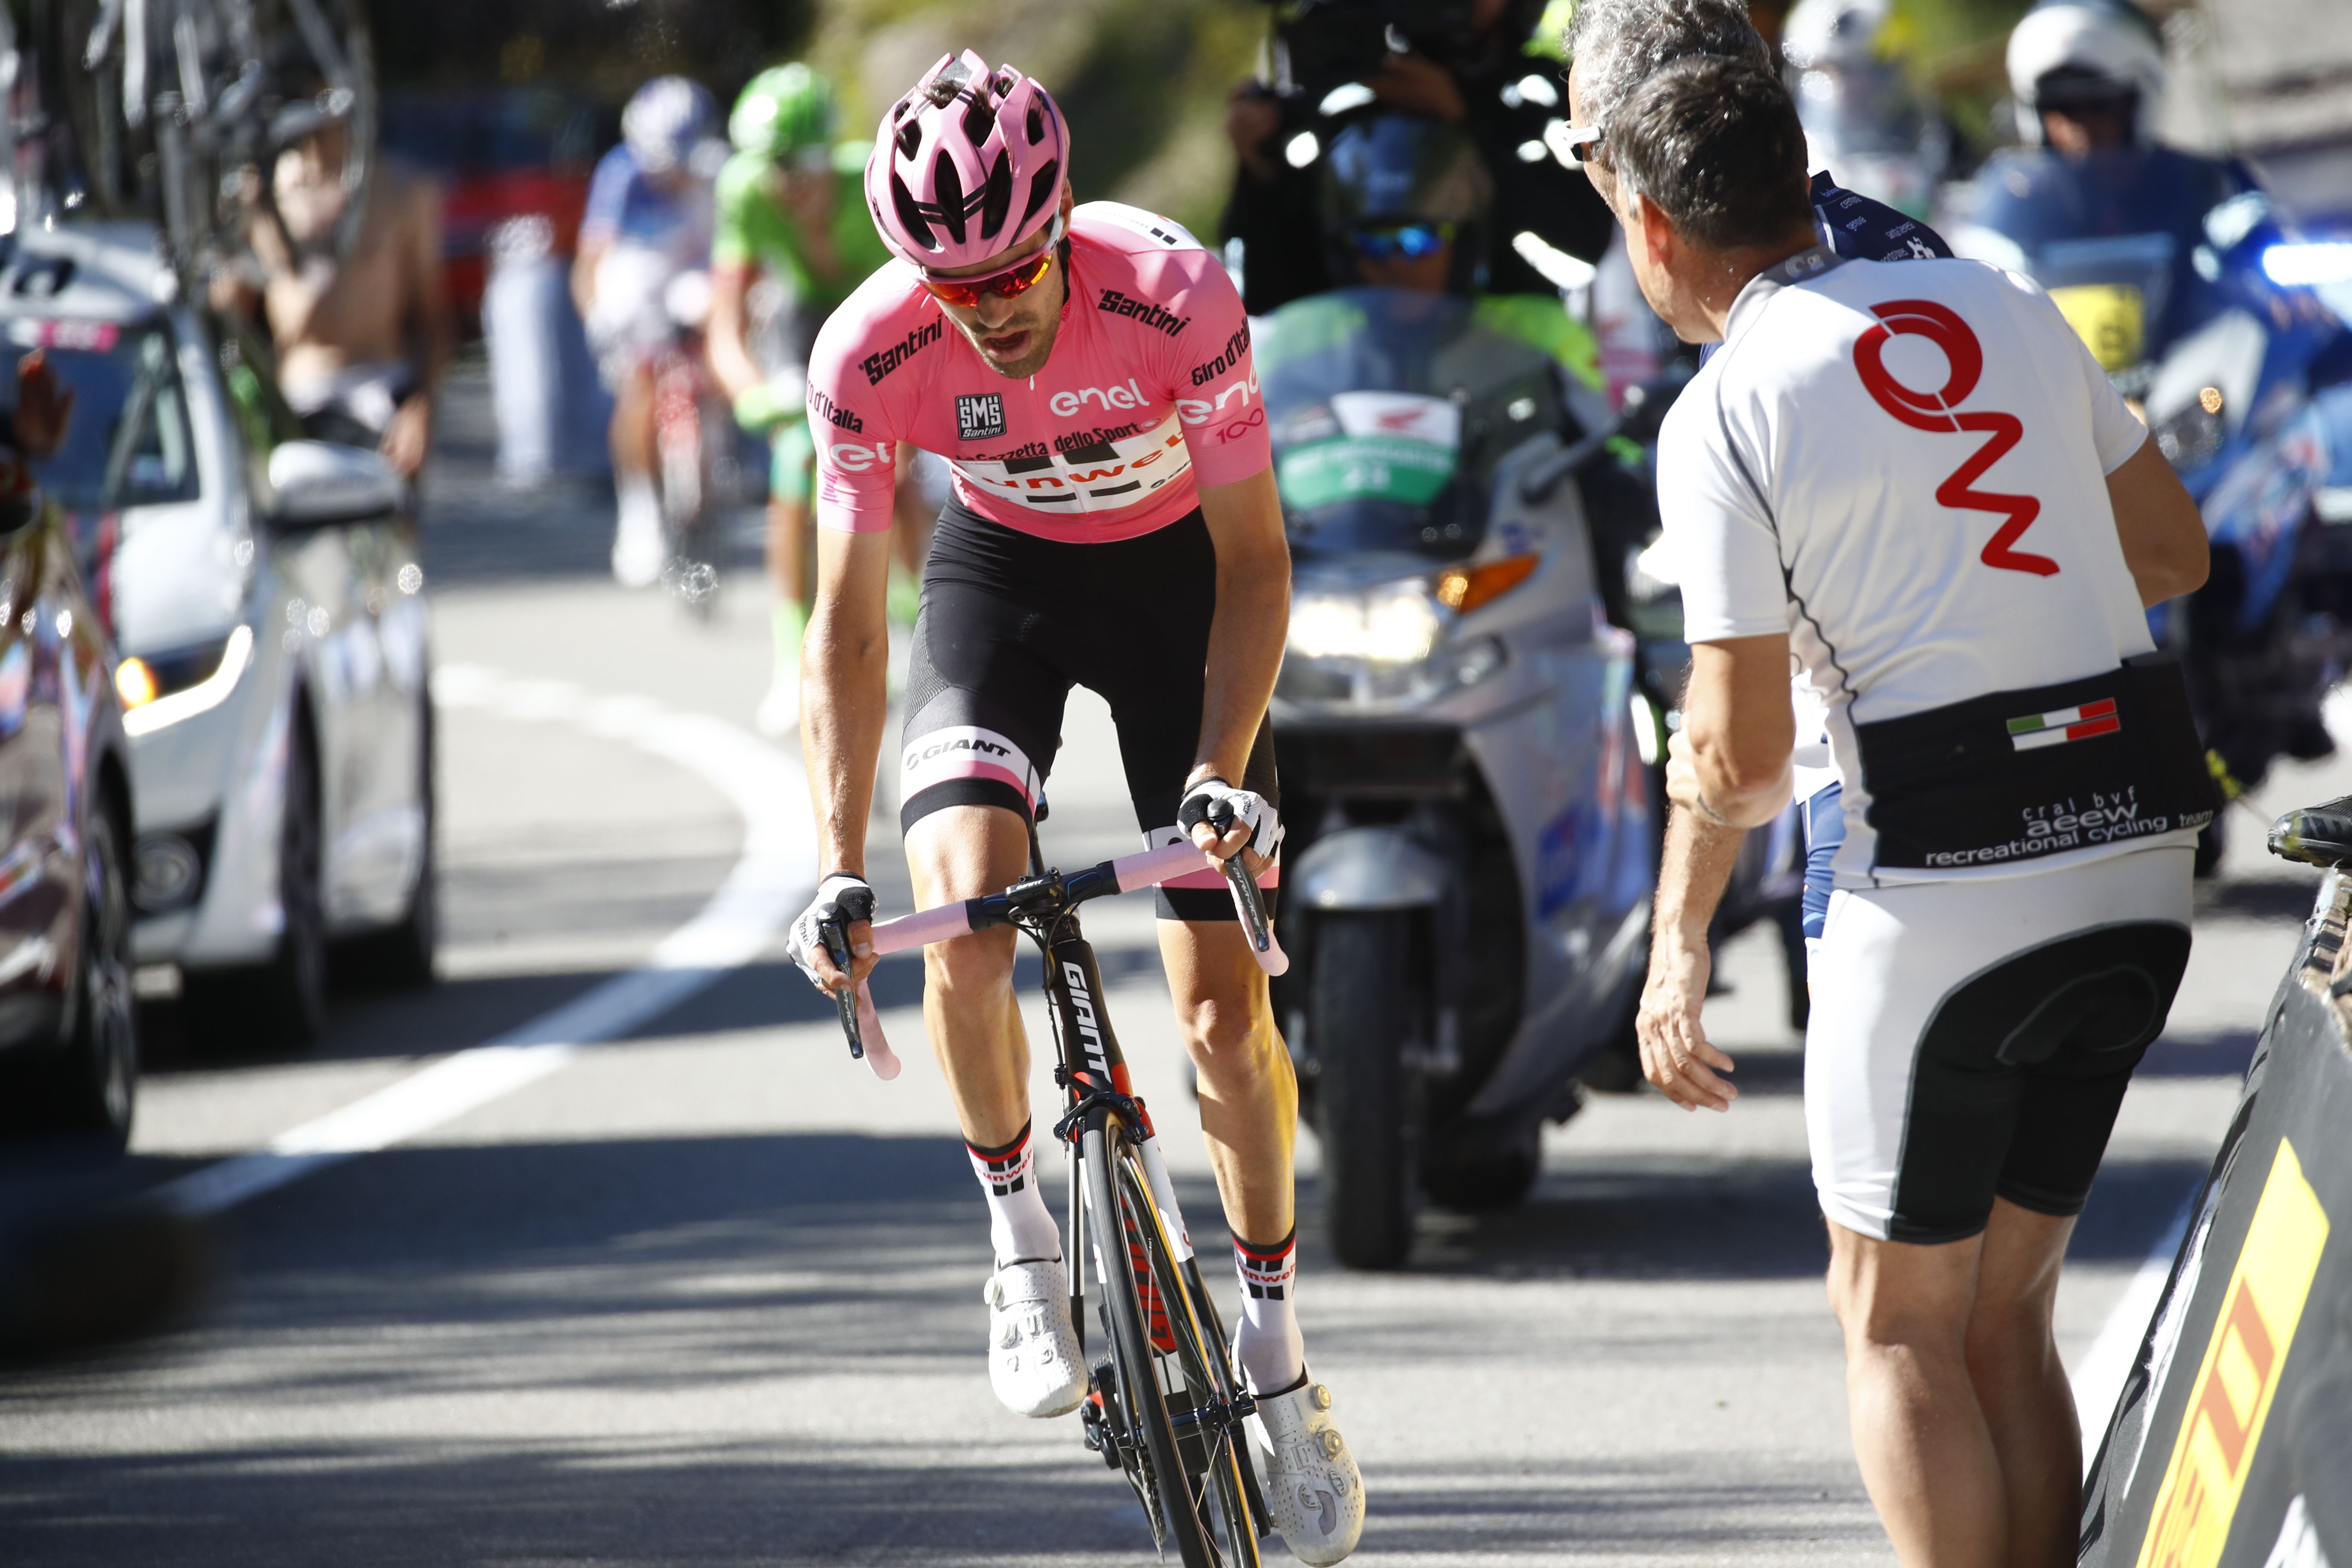 Cyclisme - Giro - Dumoulin se rapproche de la victoire, Pinot se rapproche du podium